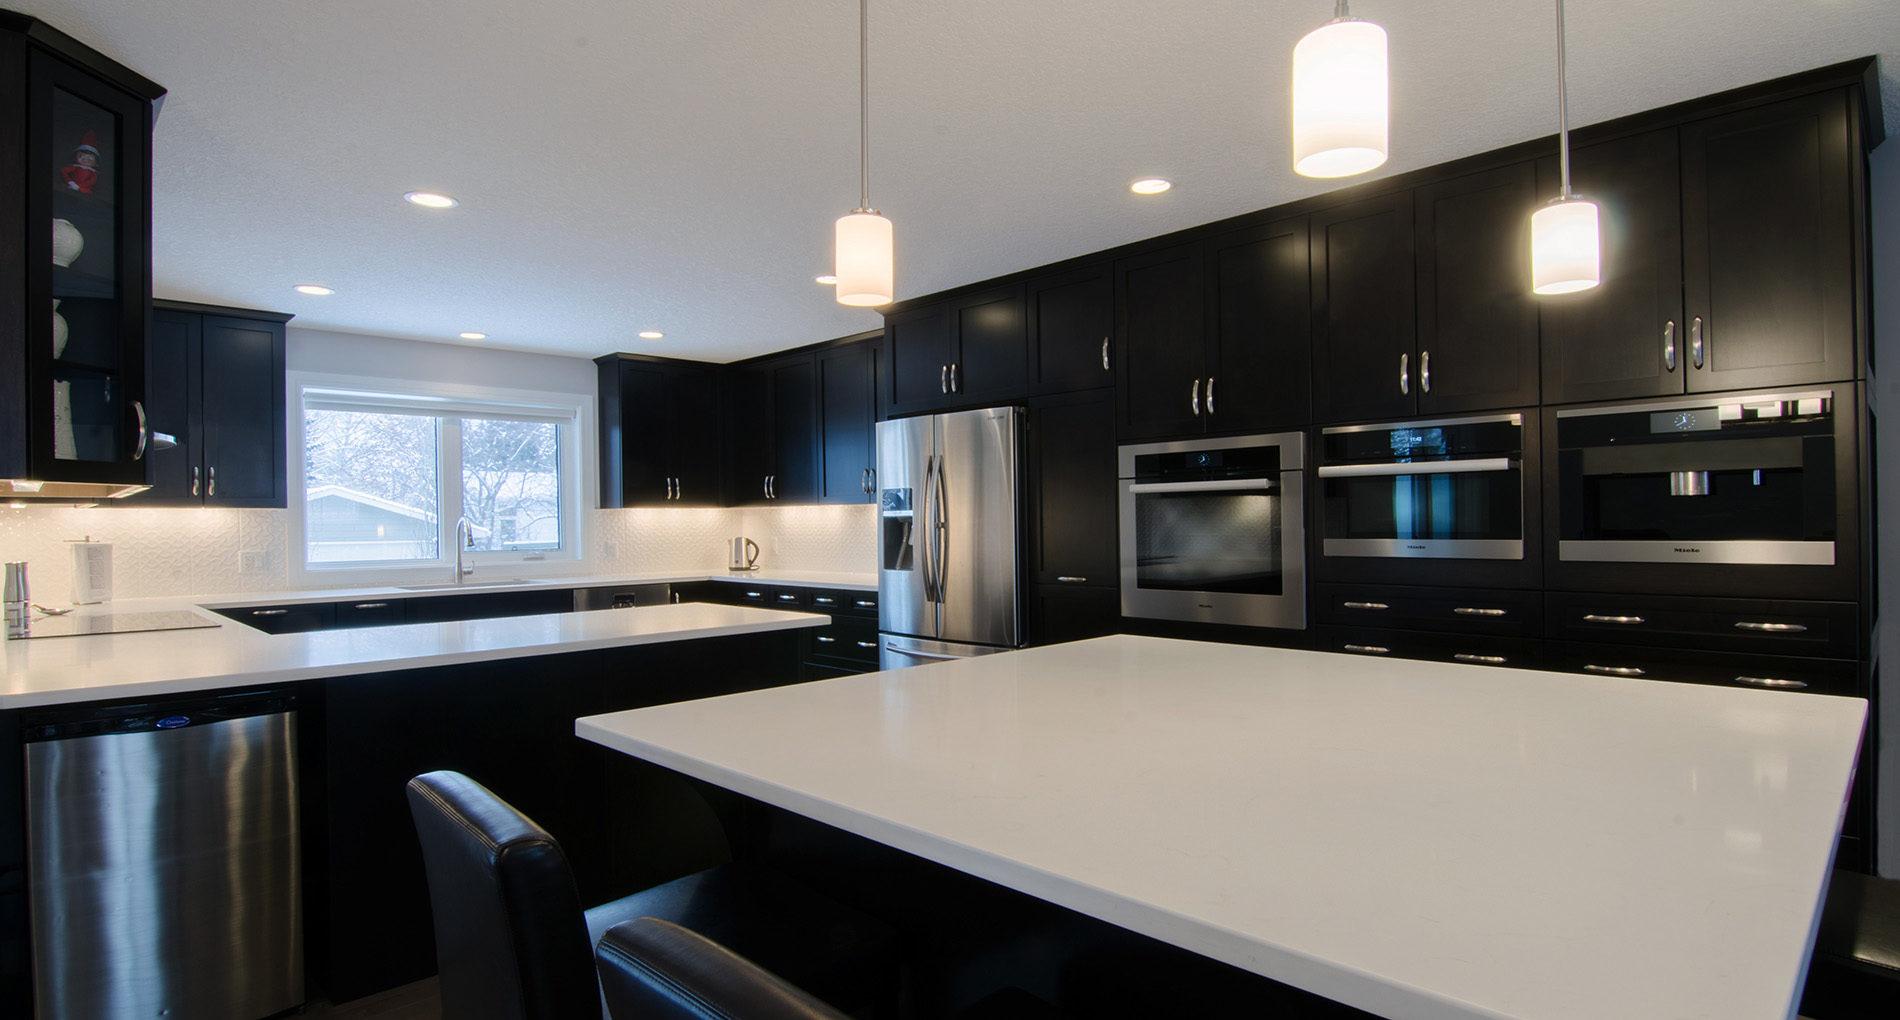 Kitchen Renovation Calgary Ursenbachrd Slider